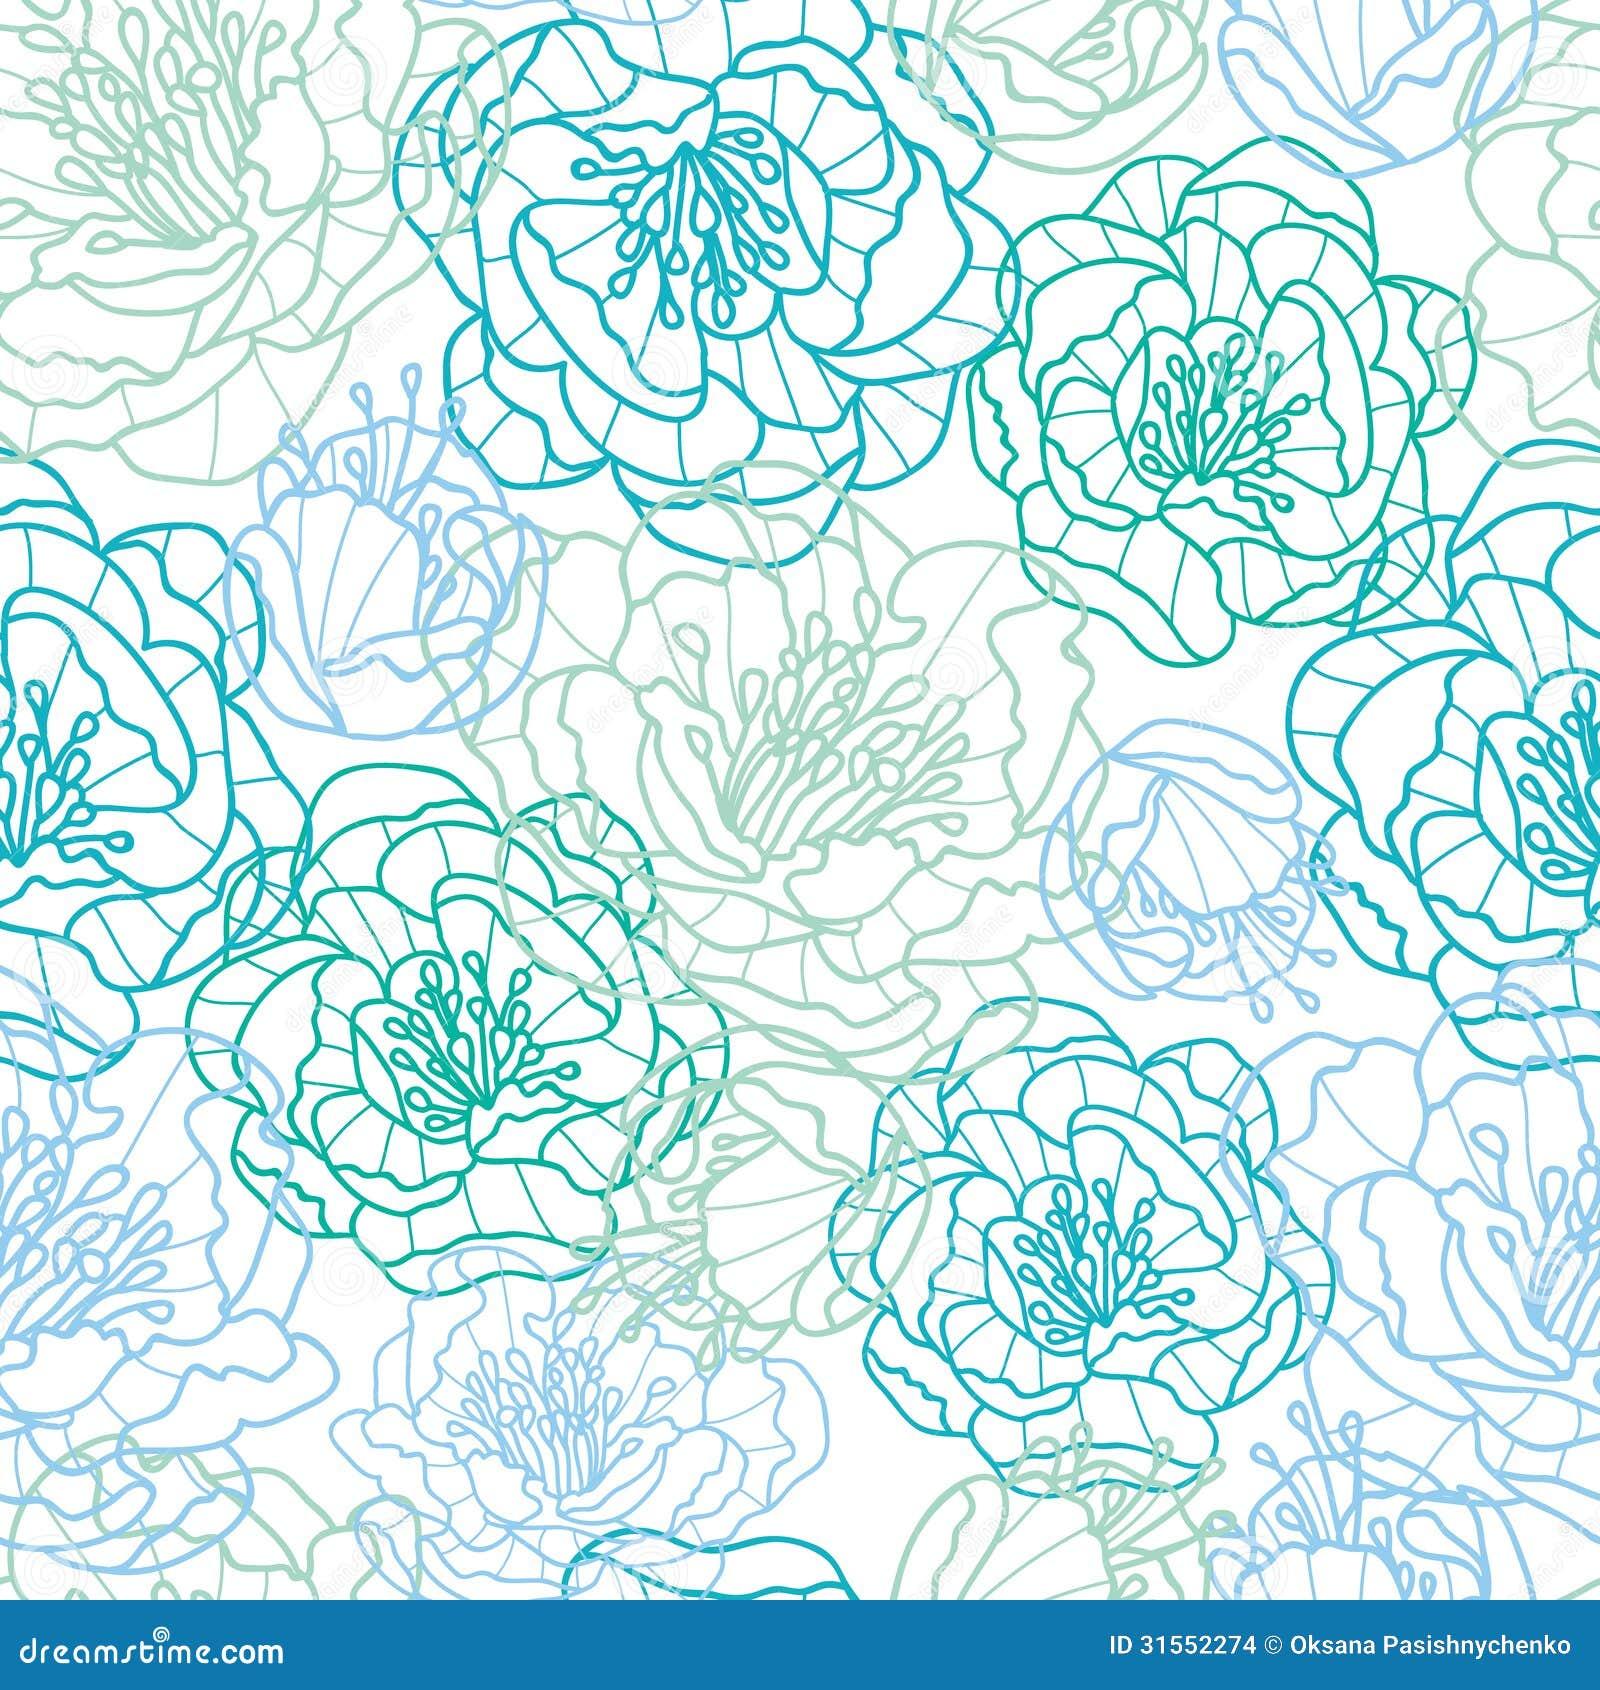 Vector Line Drawing Flower Pattern : Blue line art flowers seamless pattern background stock